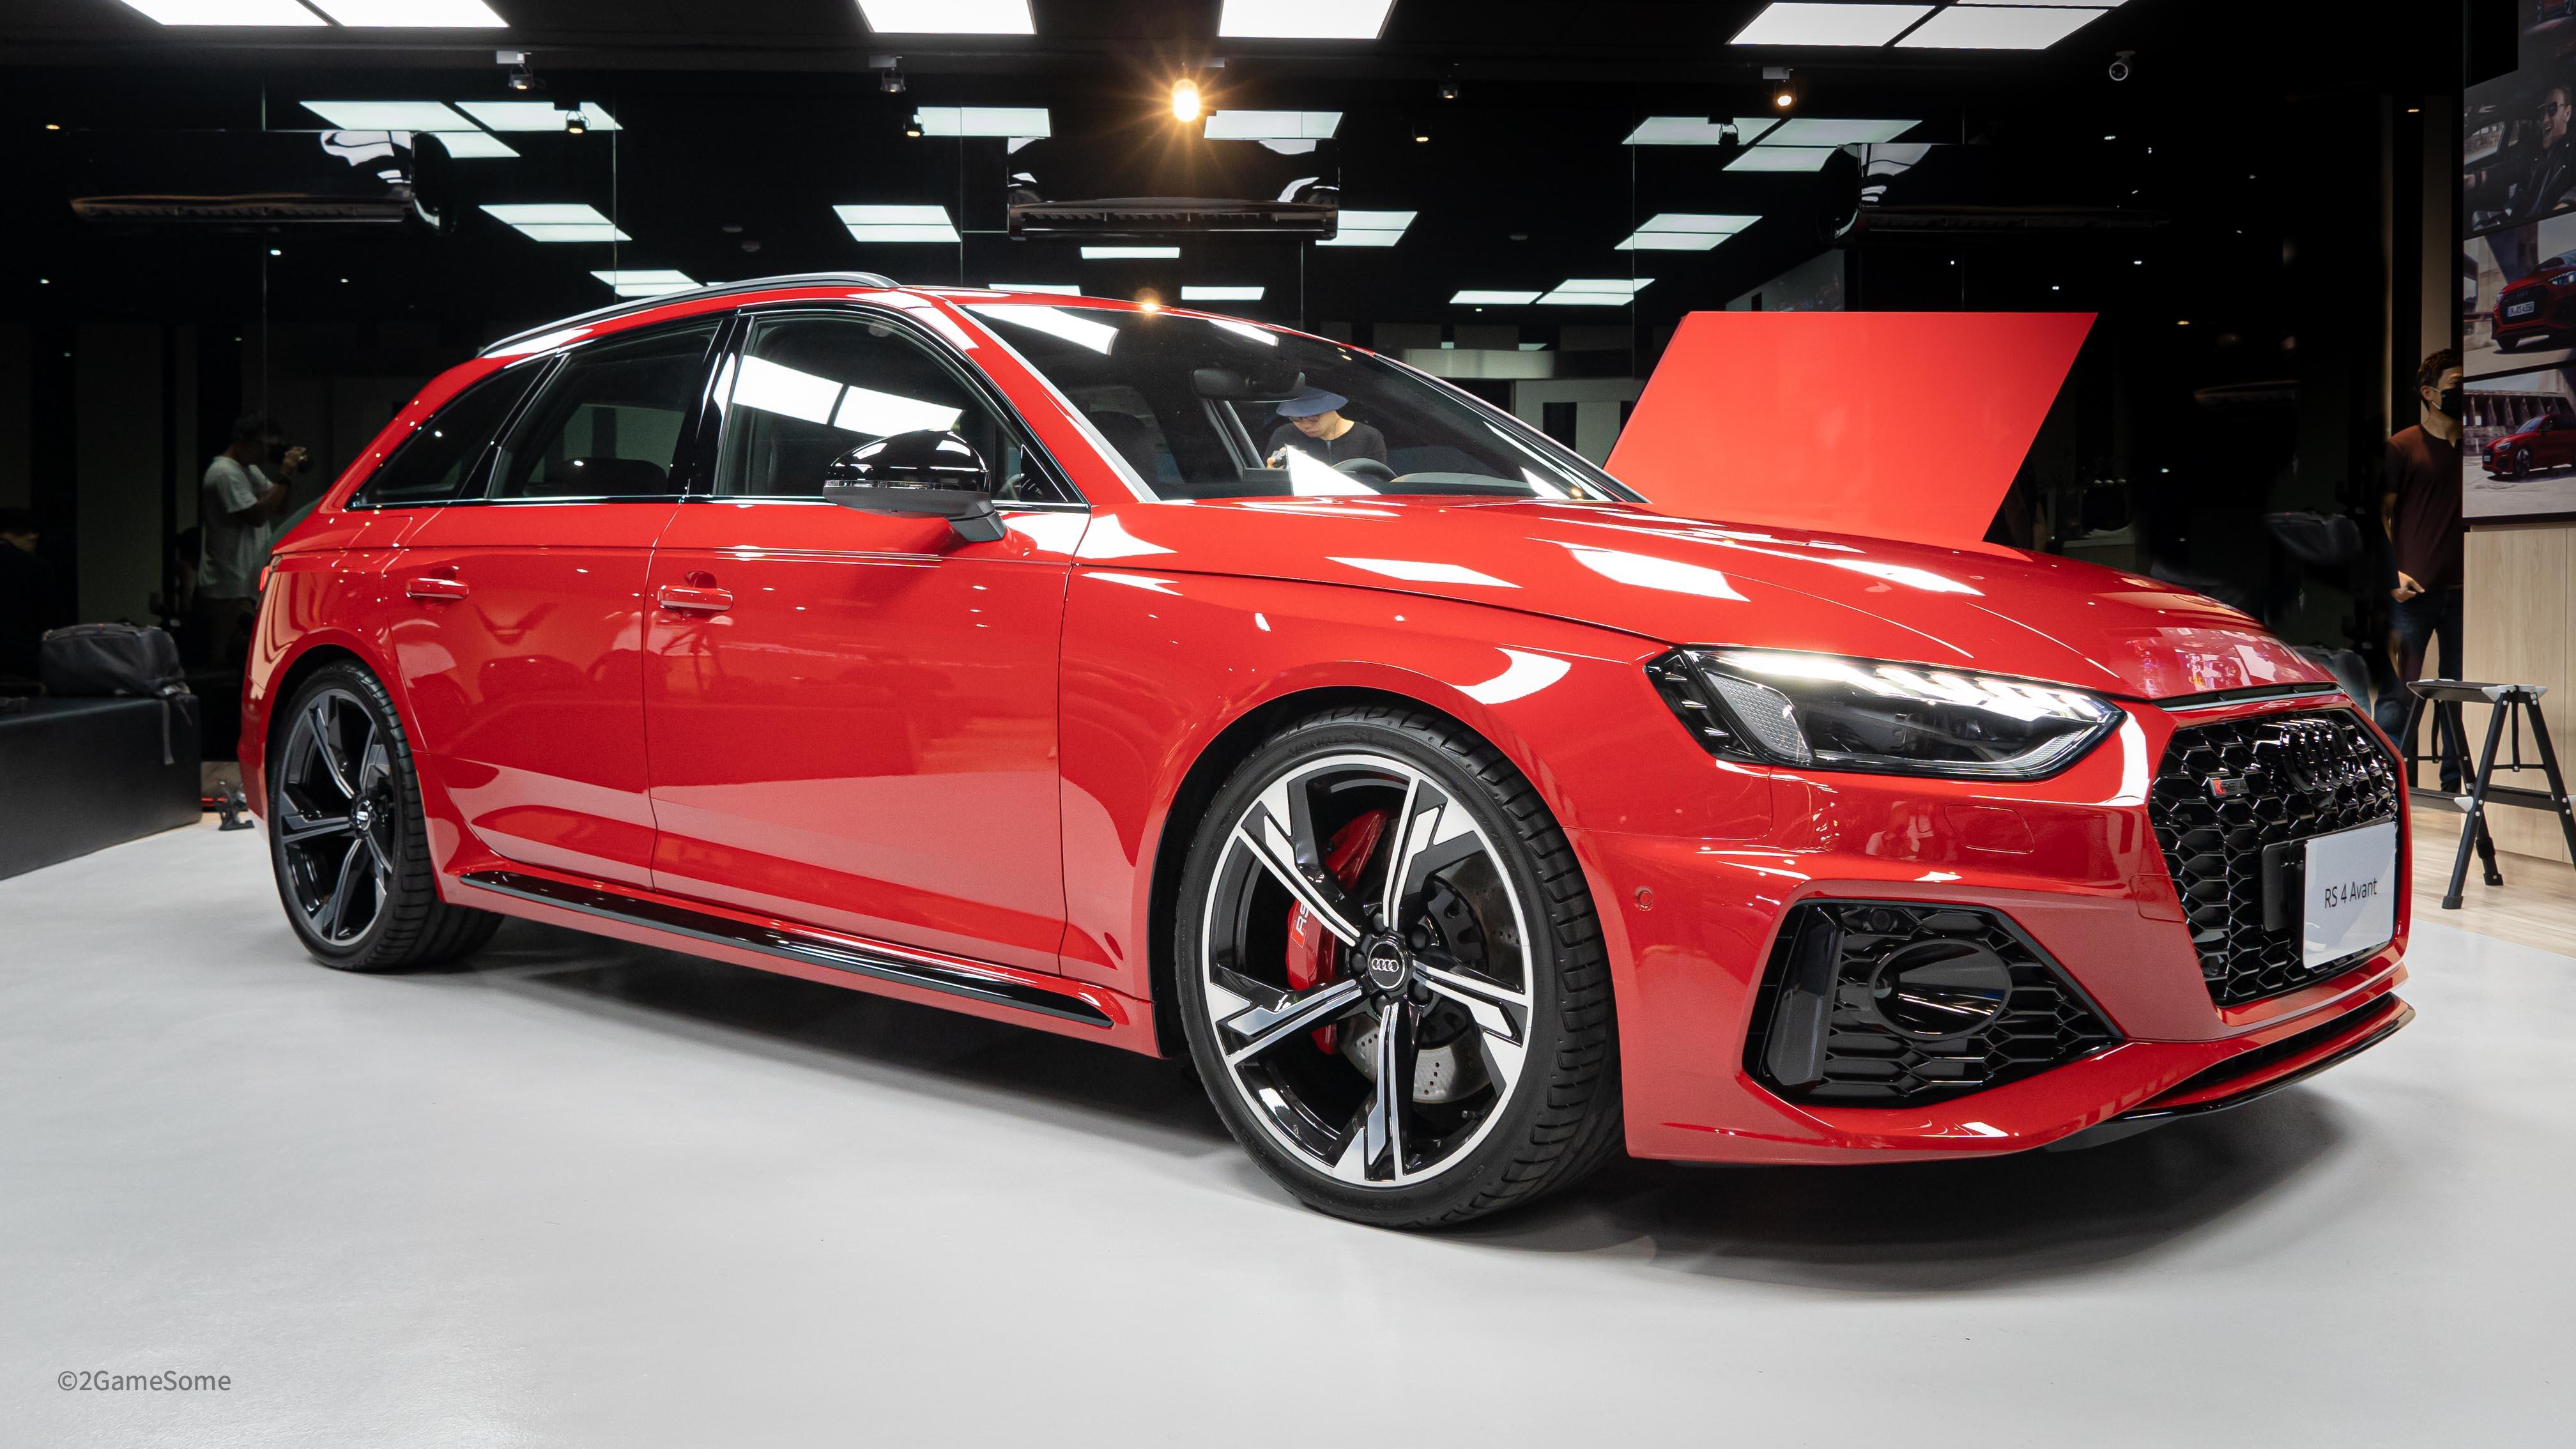 Audi RS 性能大軍年底前到齊,RS 4 Avant 搶先亮相!